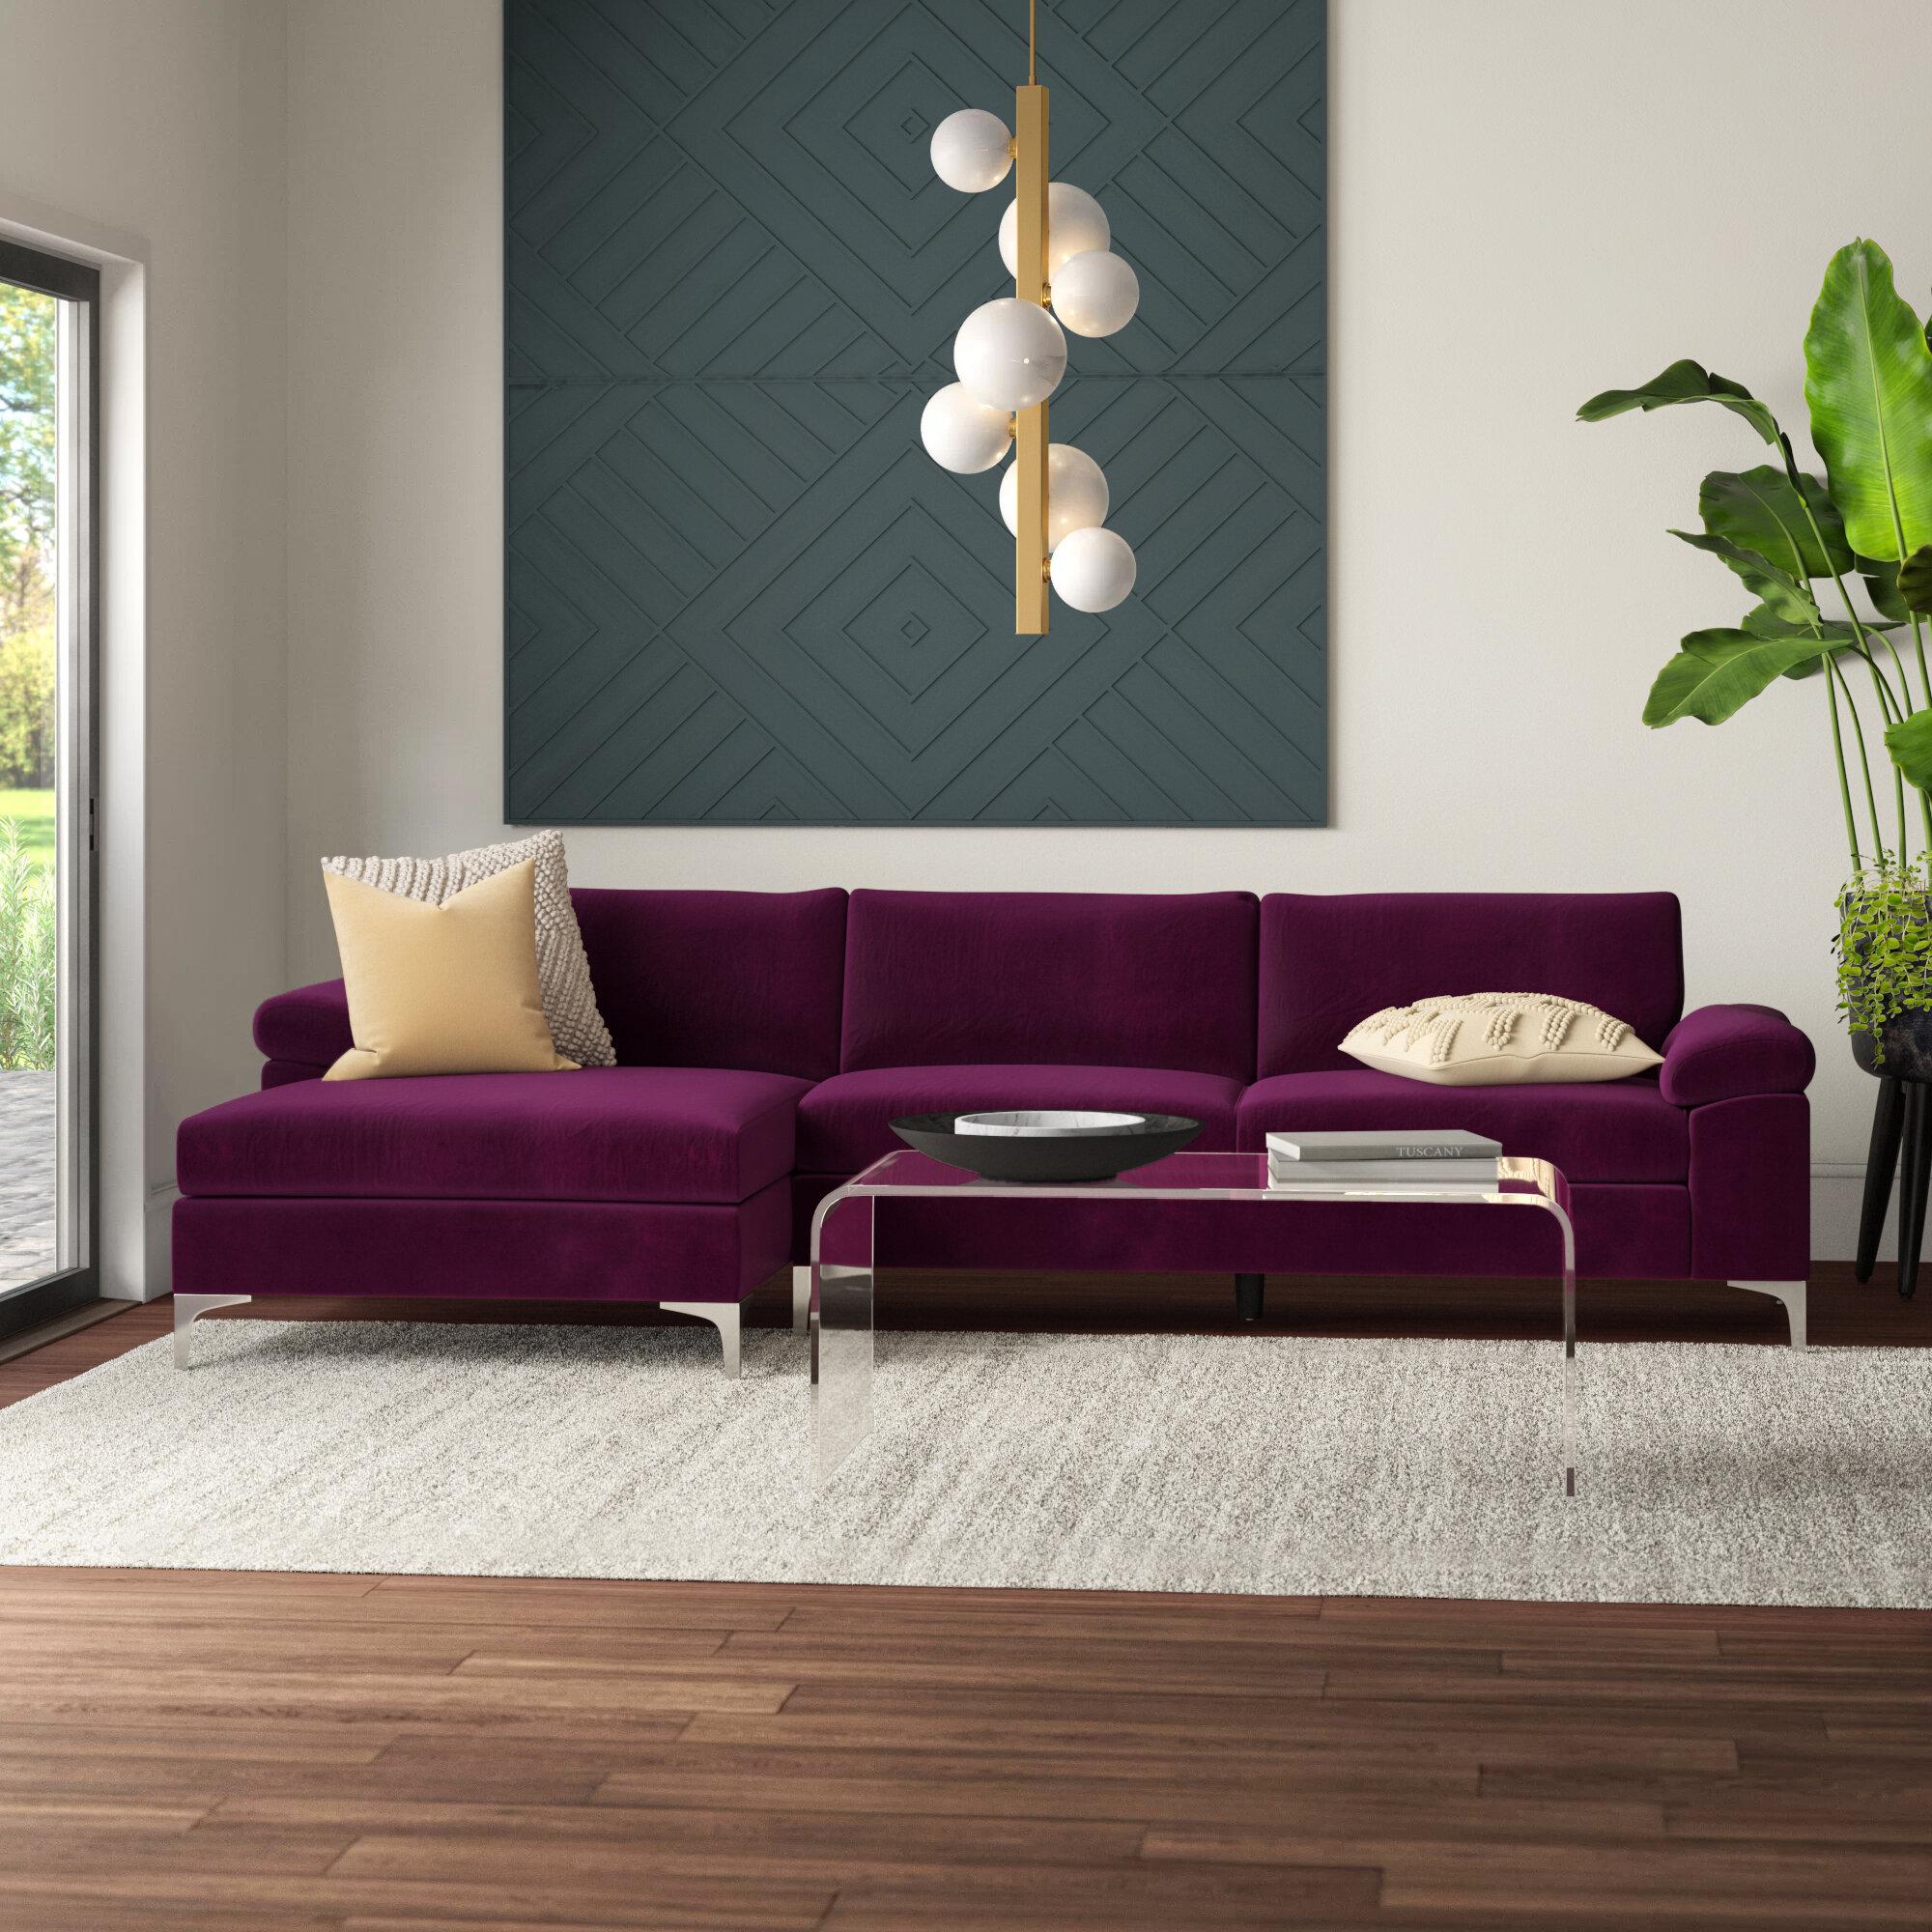 Mercury Row Martello Modern Sectional & Reviews | Wayfair on